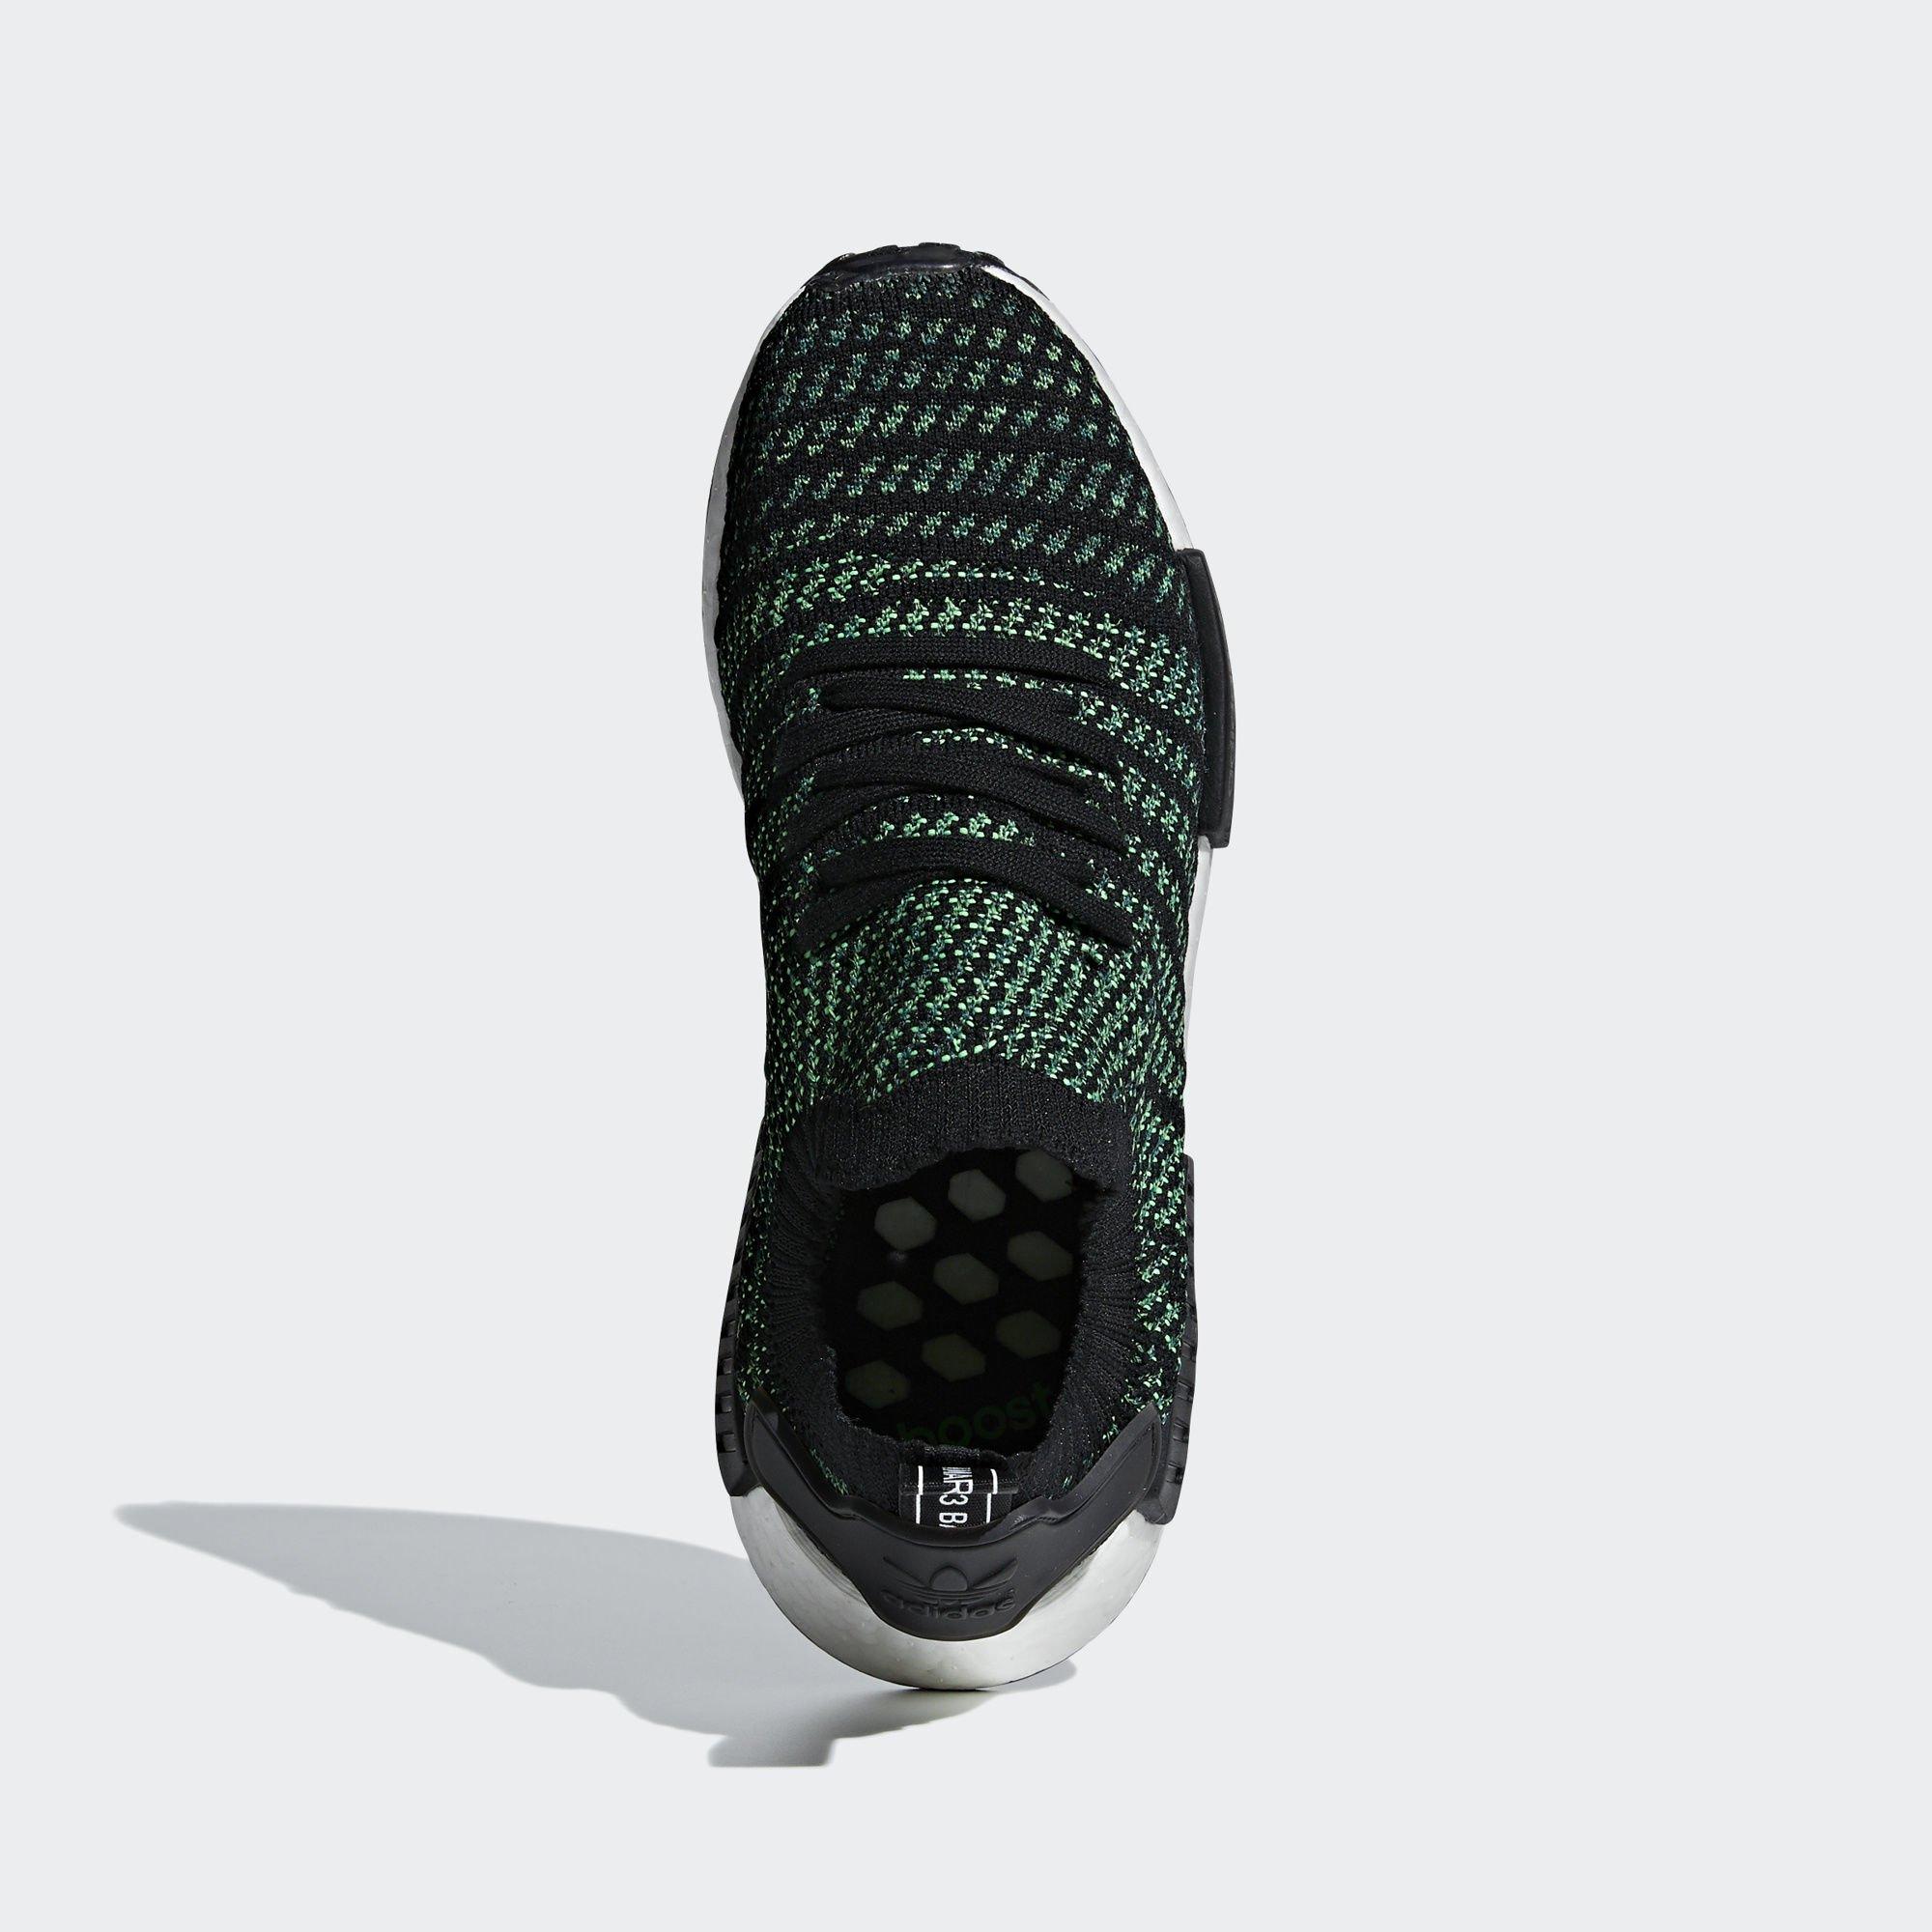 adidas NMD_R1 STLT Primeknit (AQ0936)